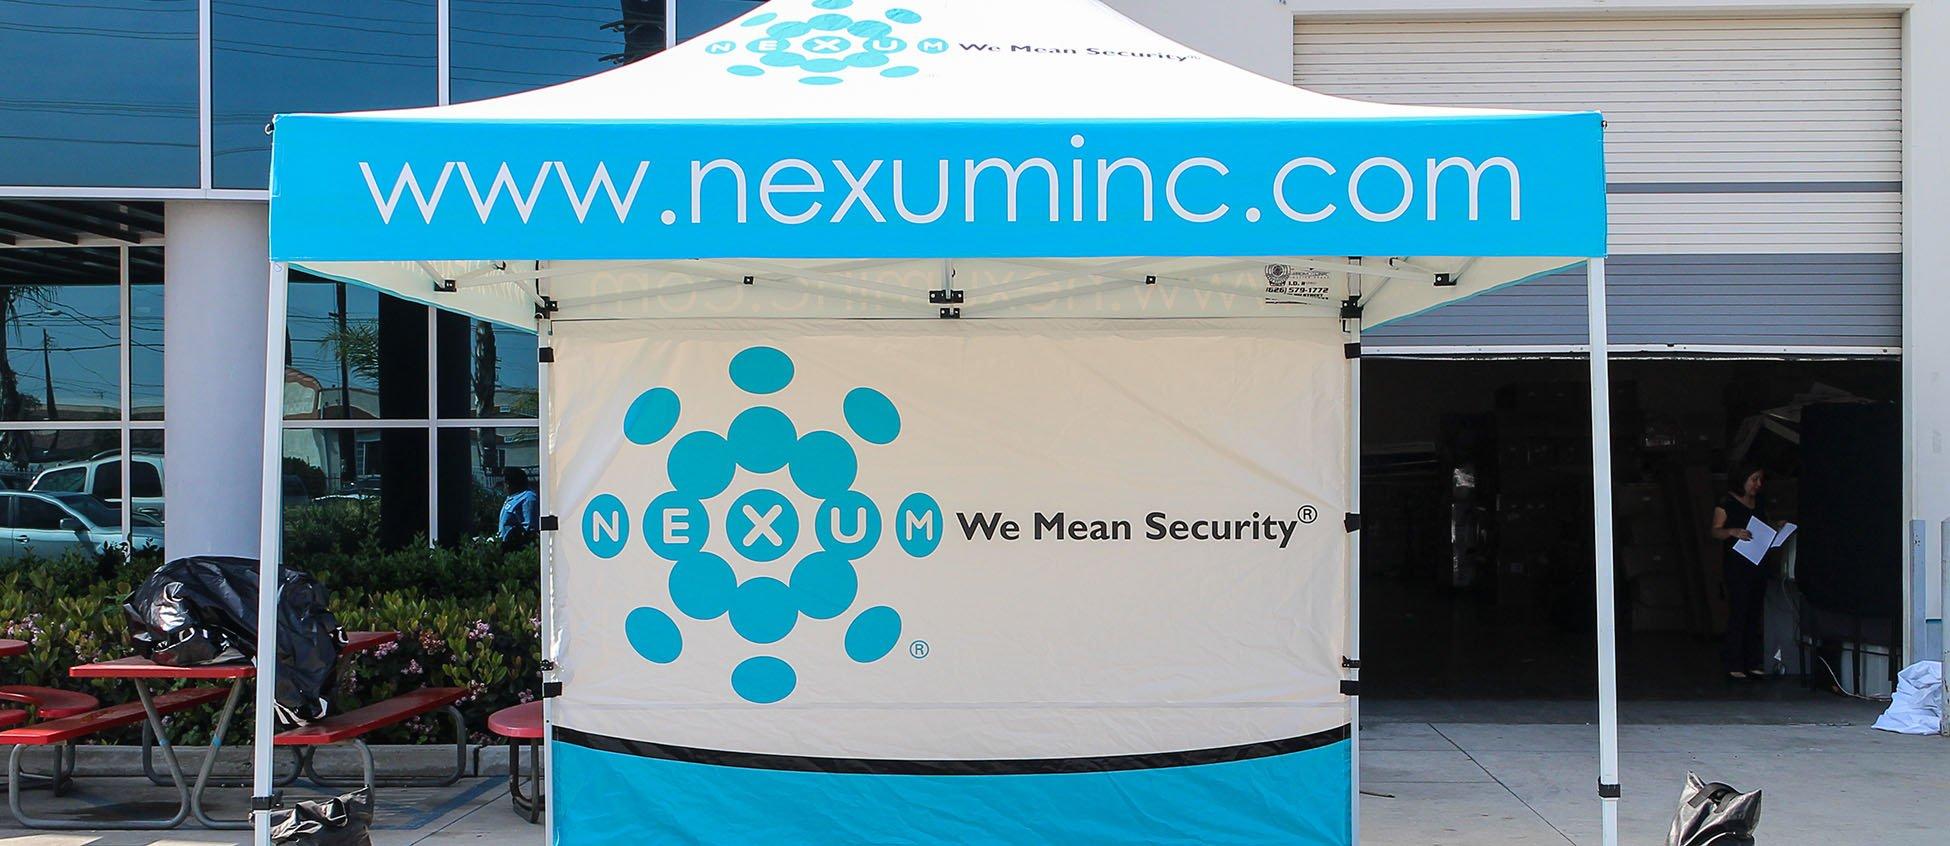 Nexum-inc-header.jpg